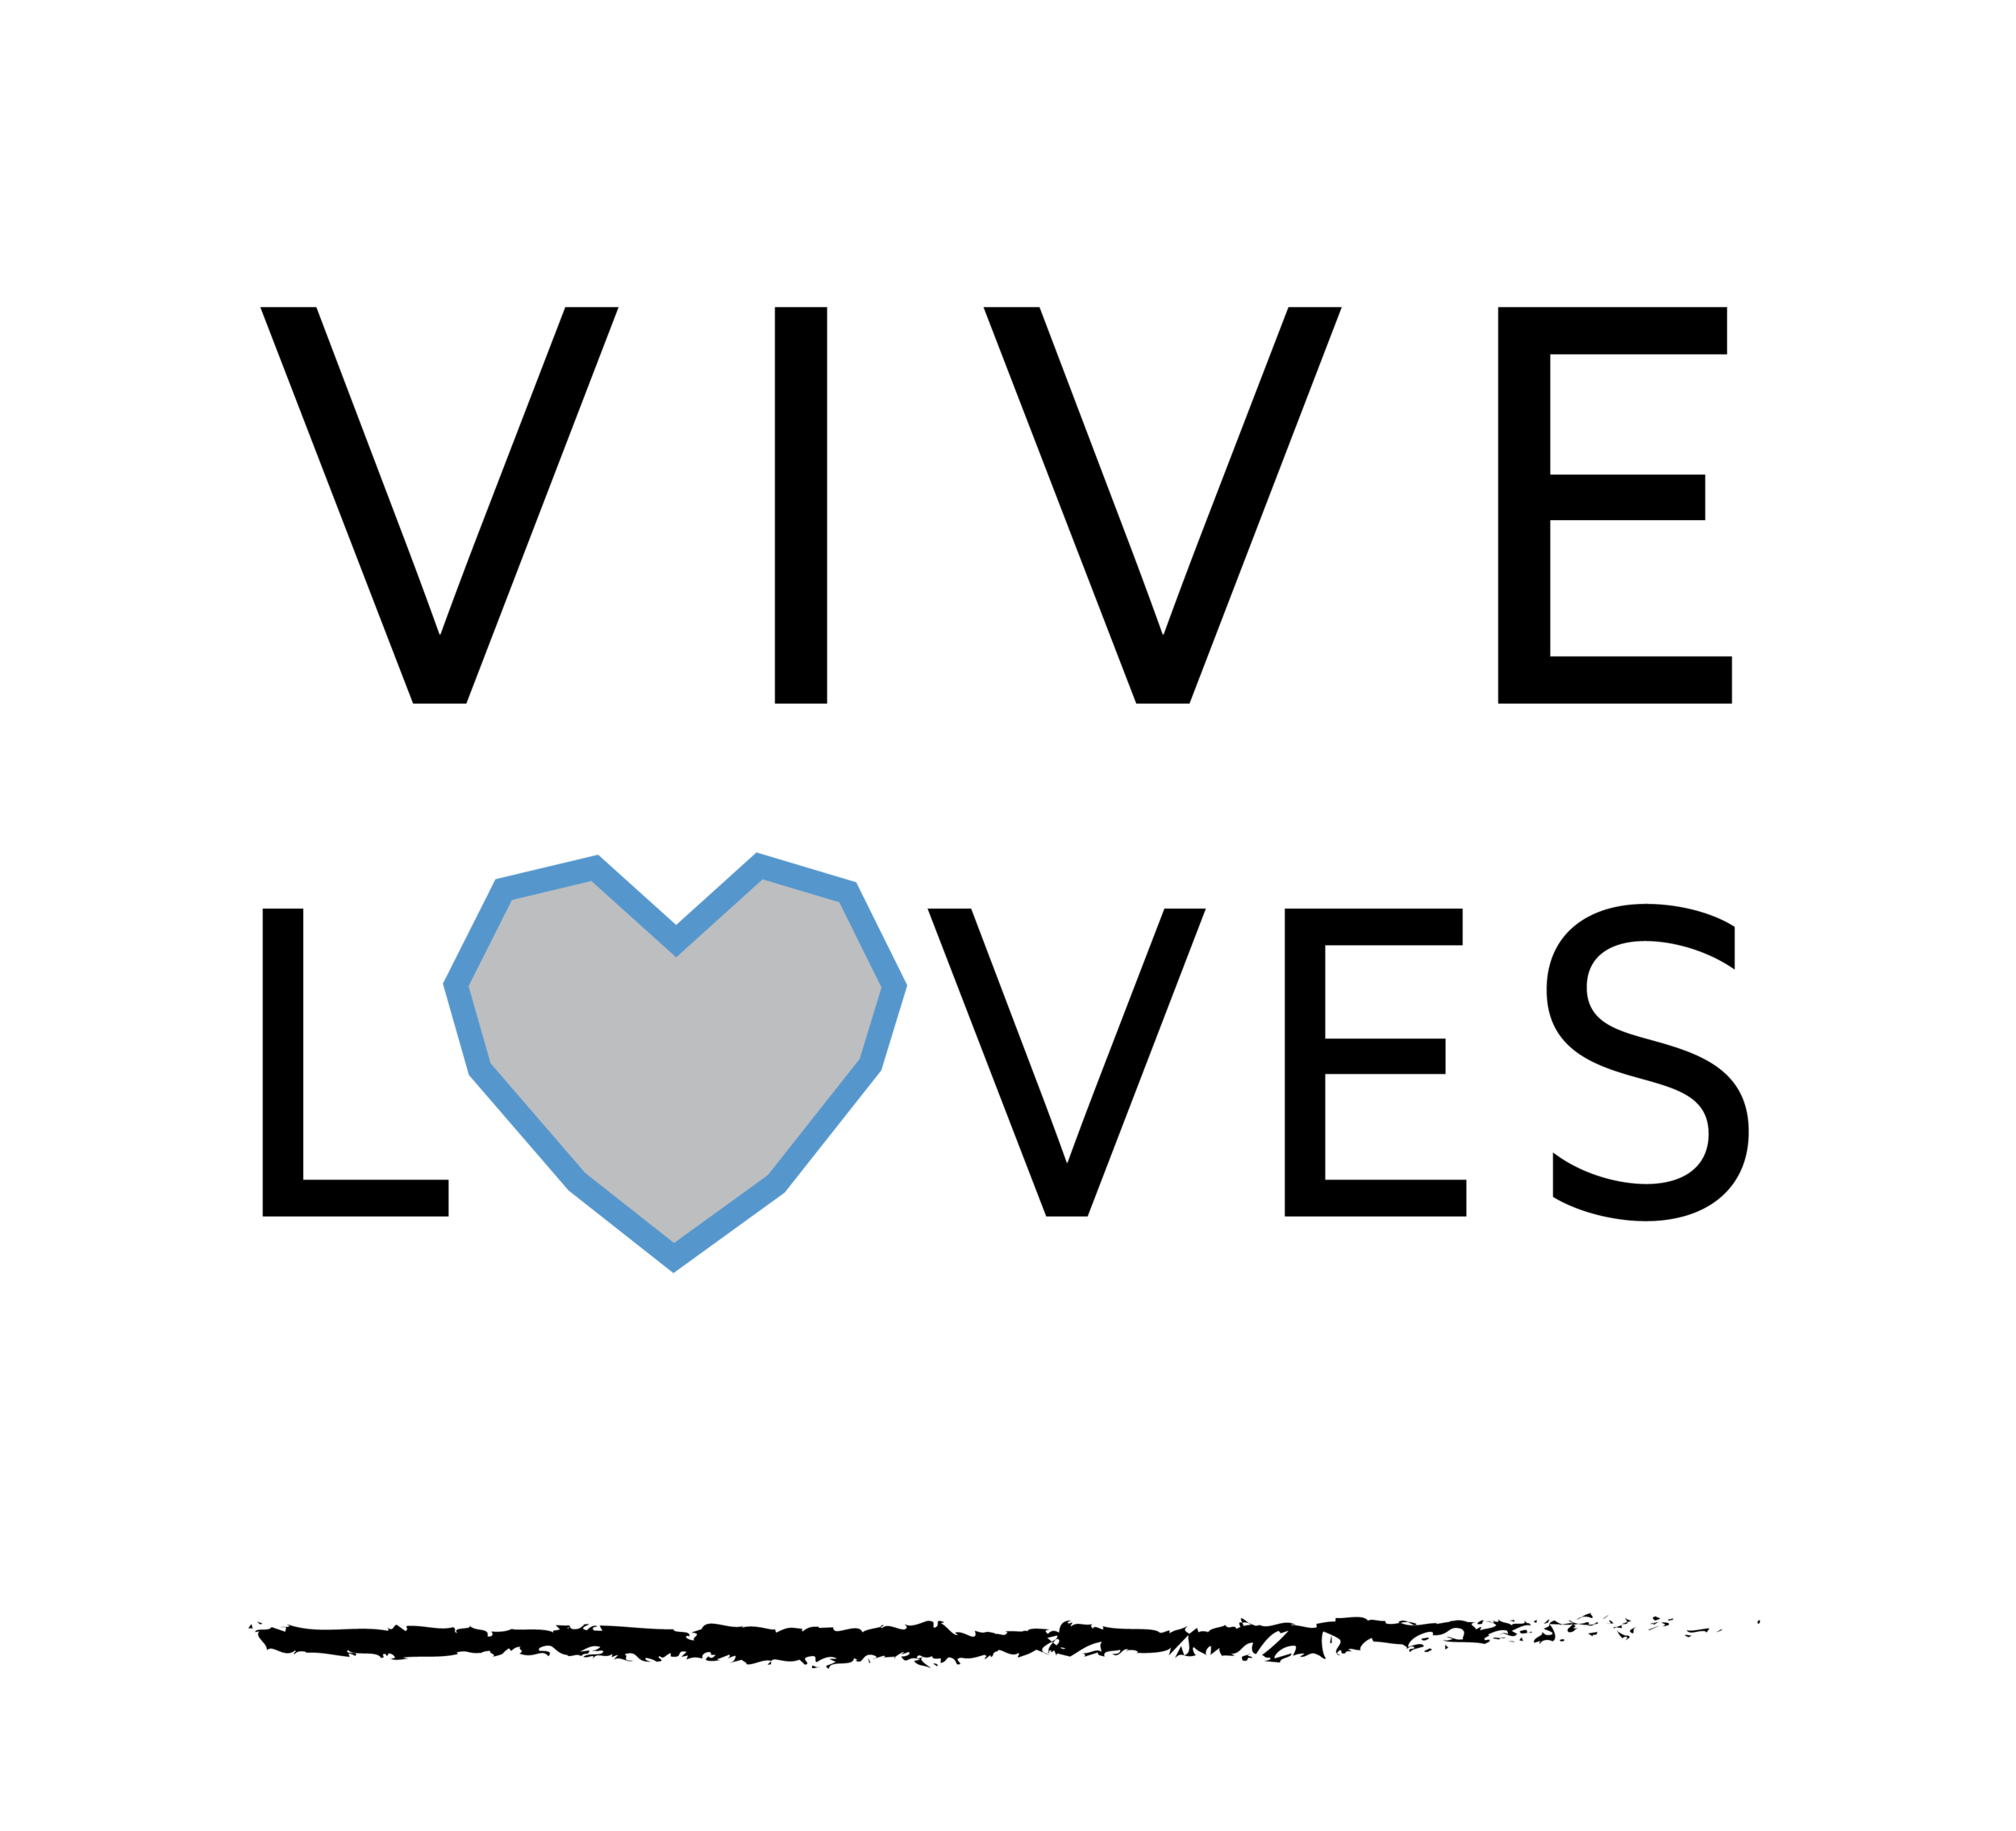 VIVELoves2018_png-25.png